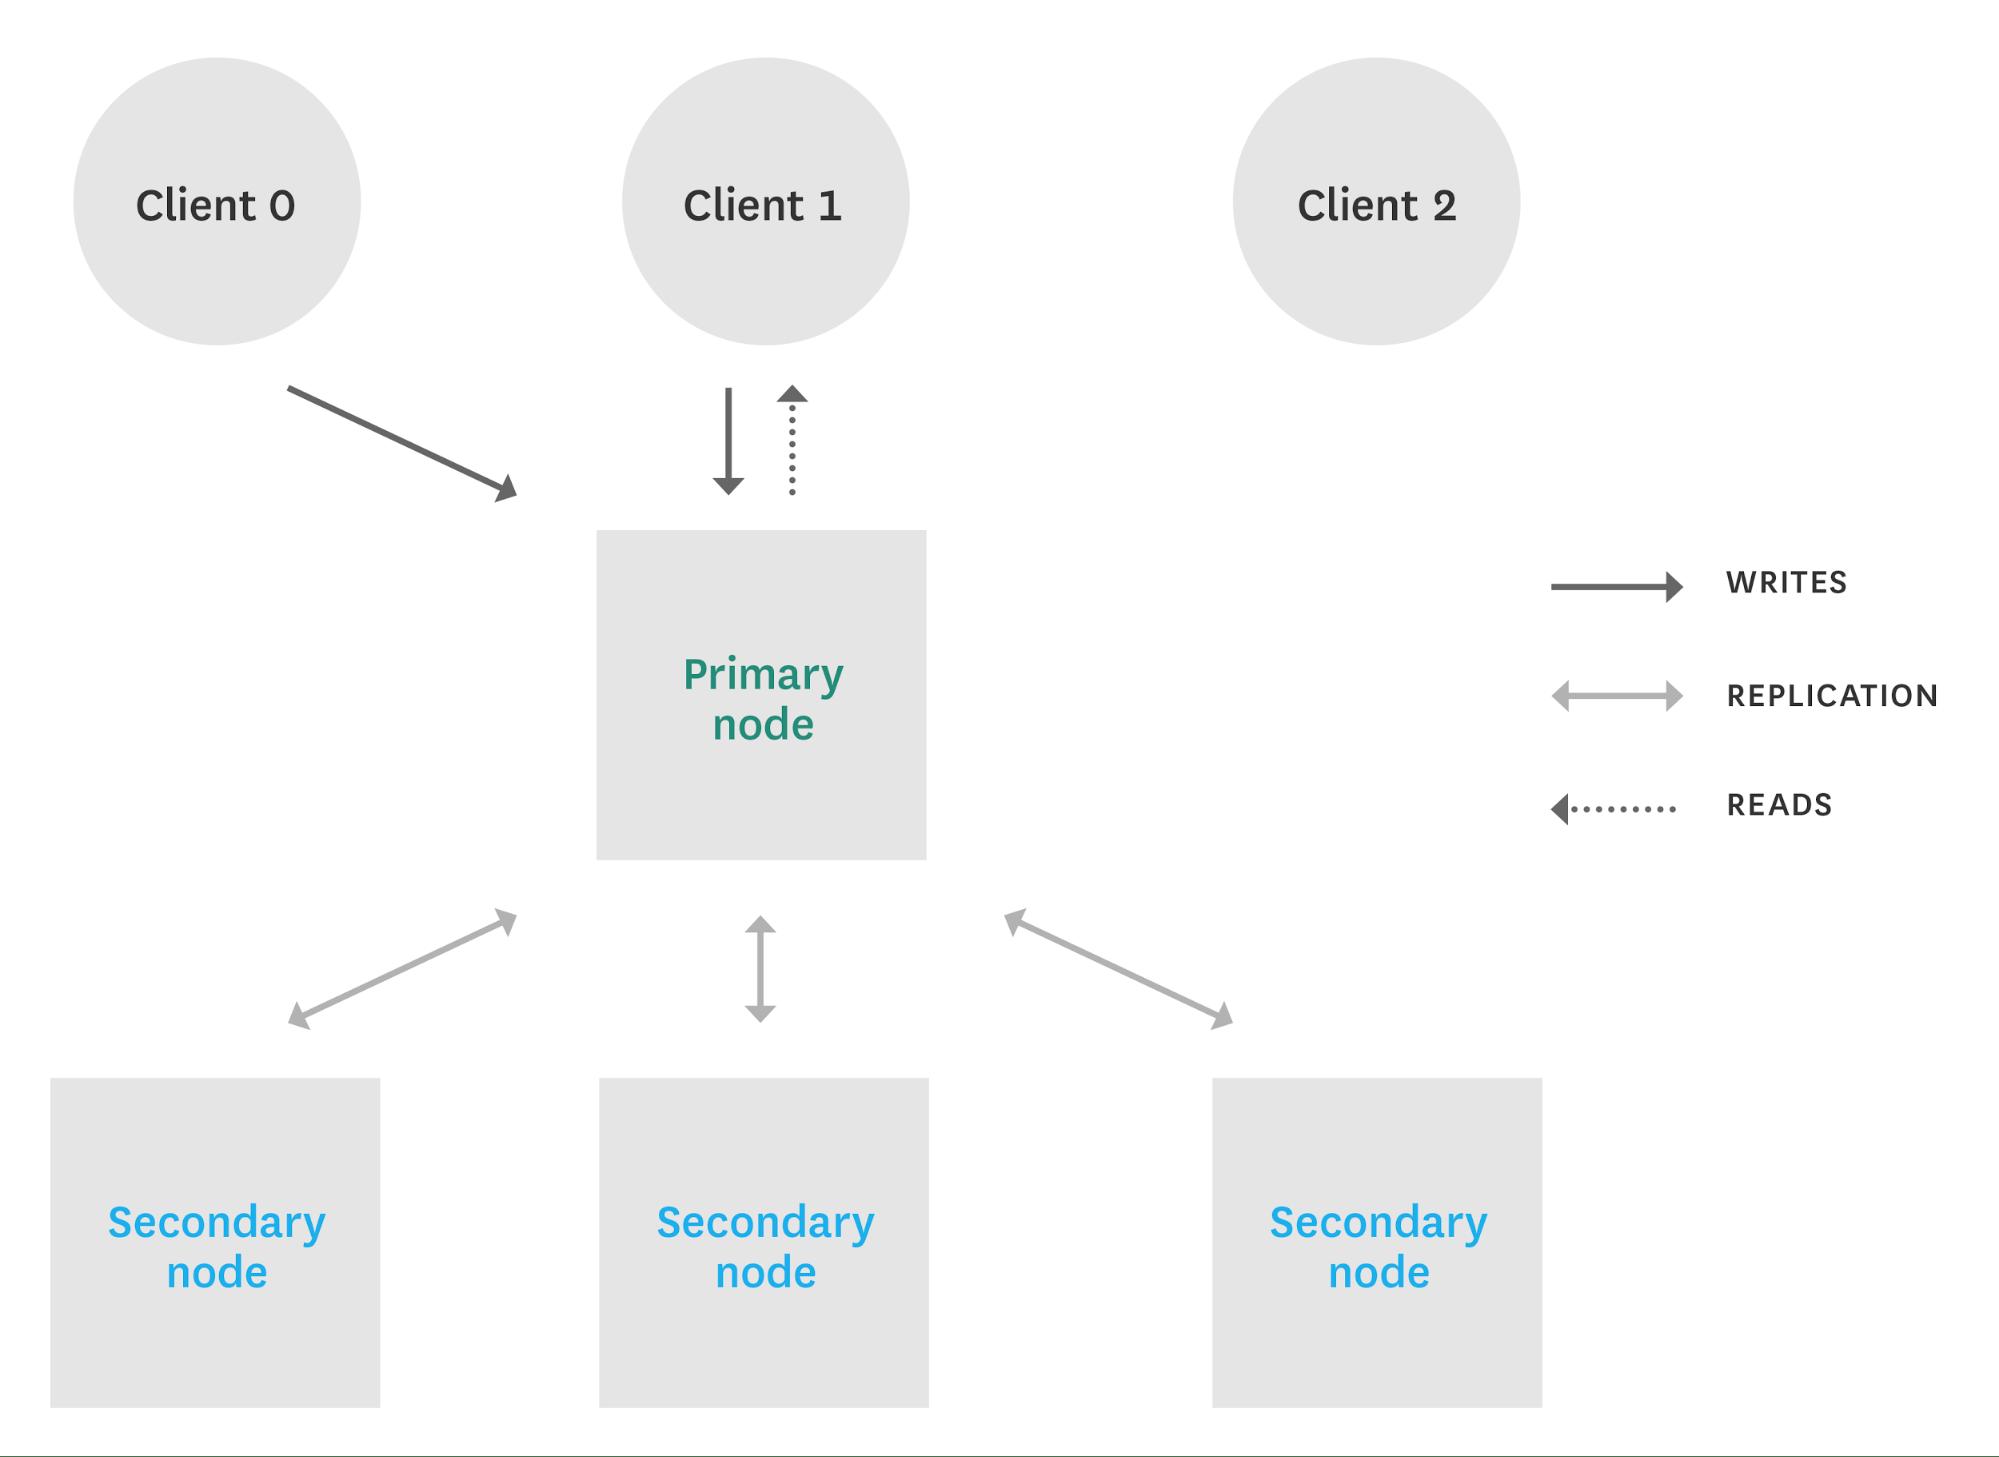 Monitoring MongoDB performance - sharding vs replication